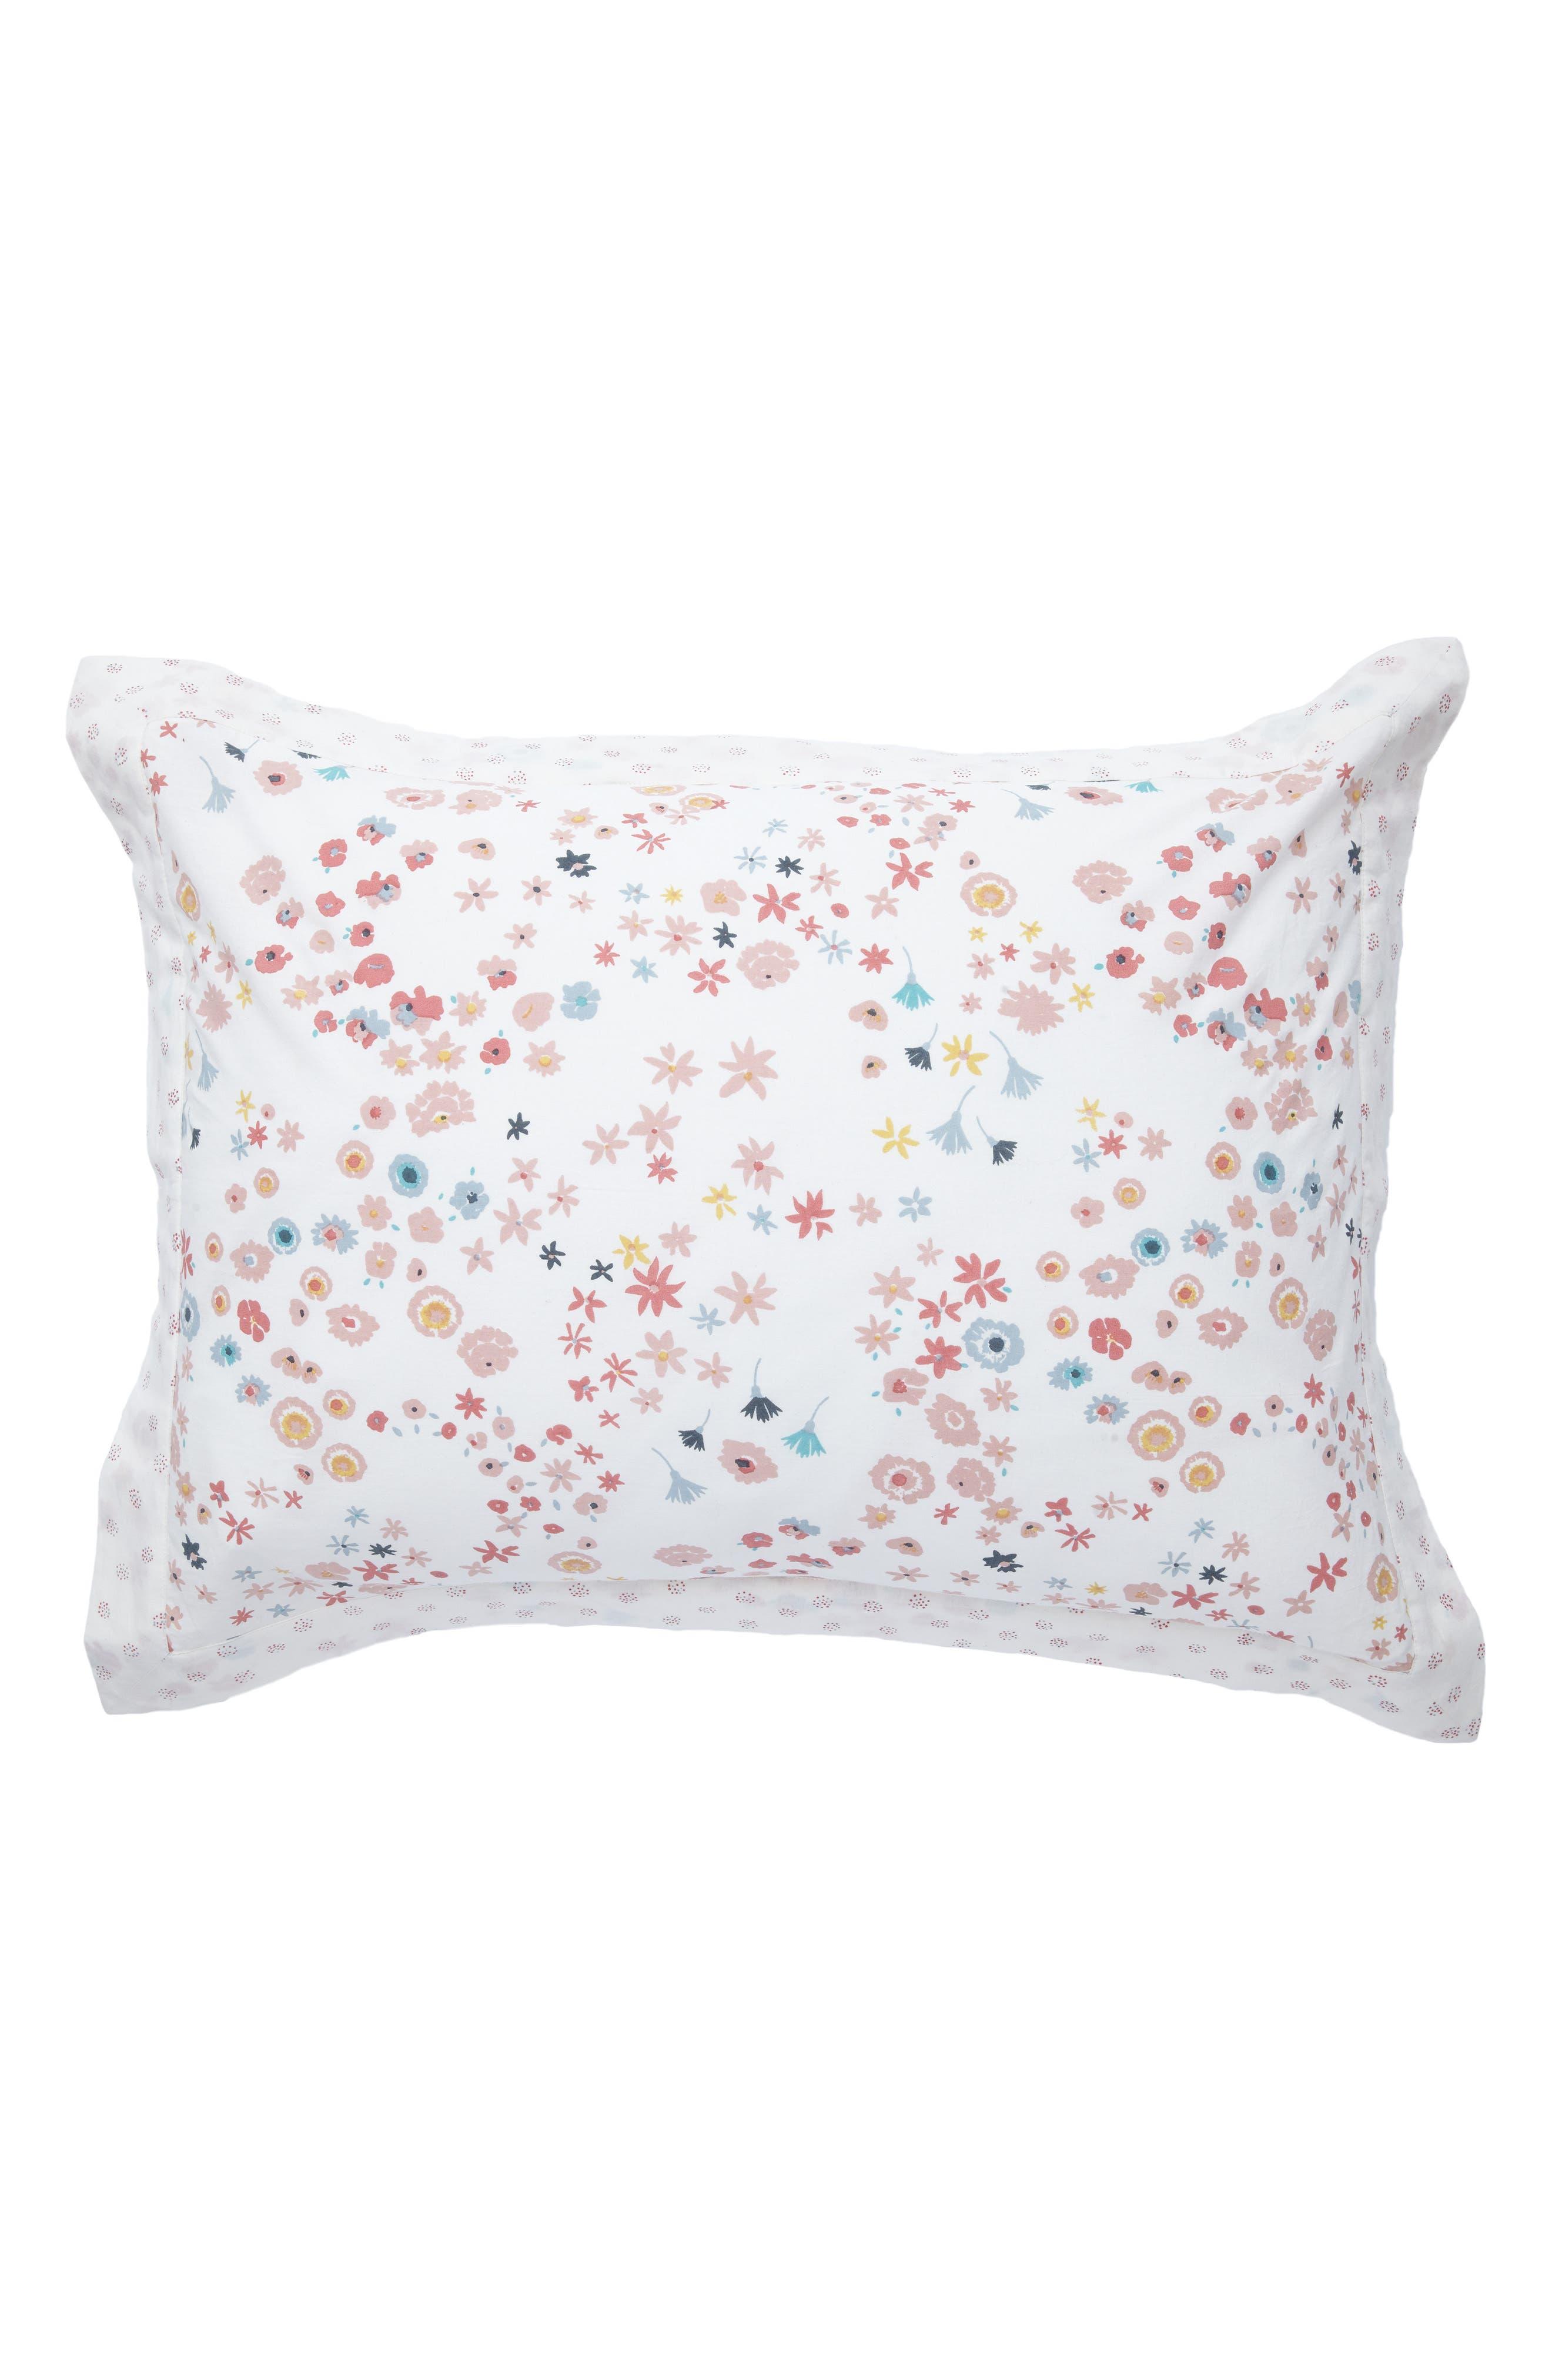 Reversible Standard Pillow Sham,                         Main,                         color, 650